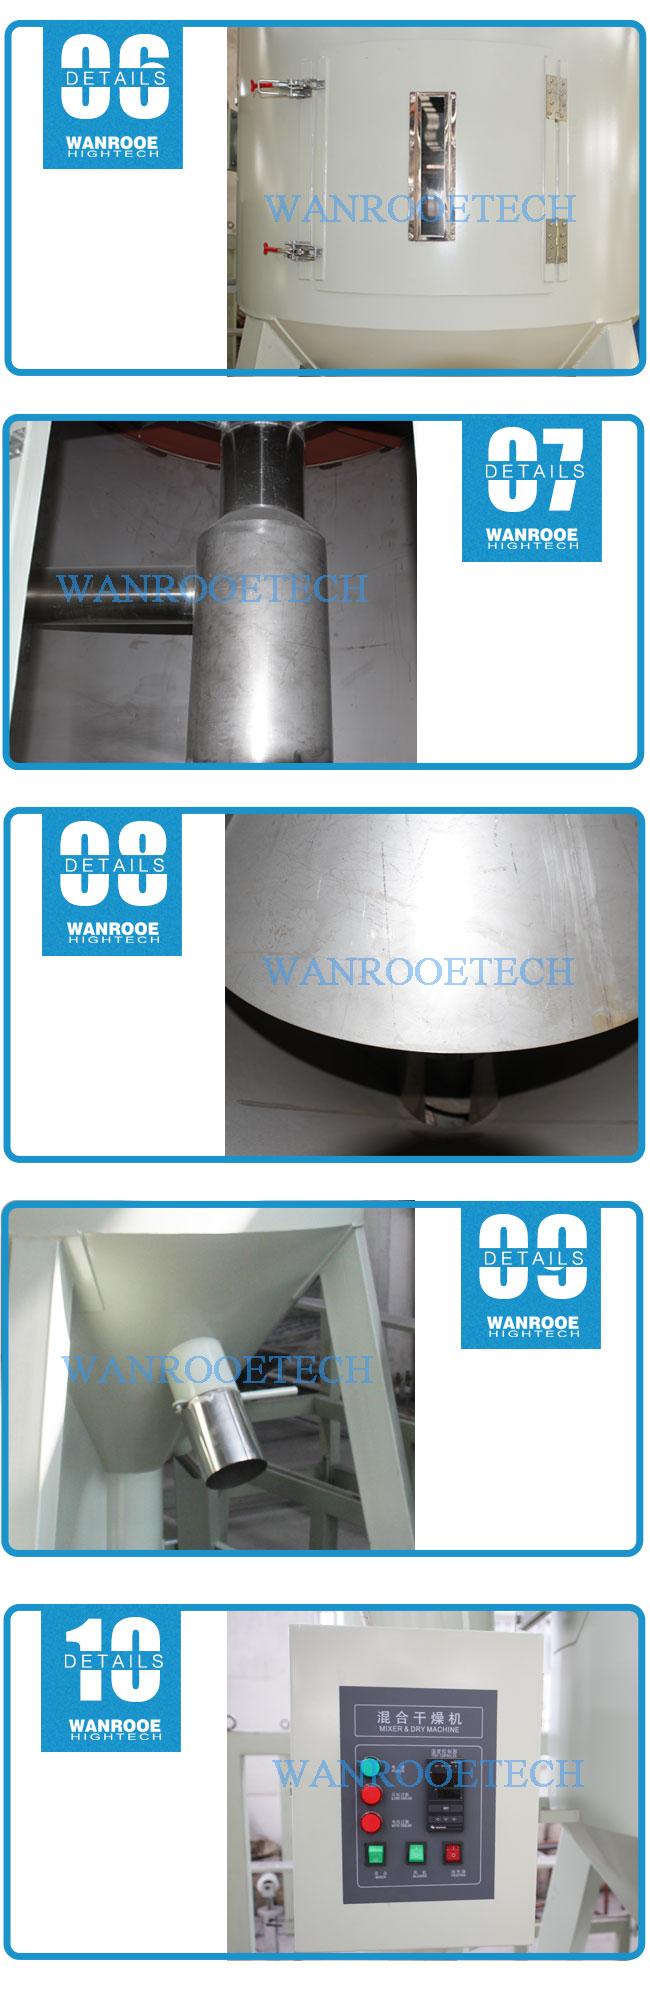 Plastic Mixer Dryer, Plastic Masterbatch Mixer Machine,Vertical Plastic Granules Mixing Dryer, Lift Drying Mixer